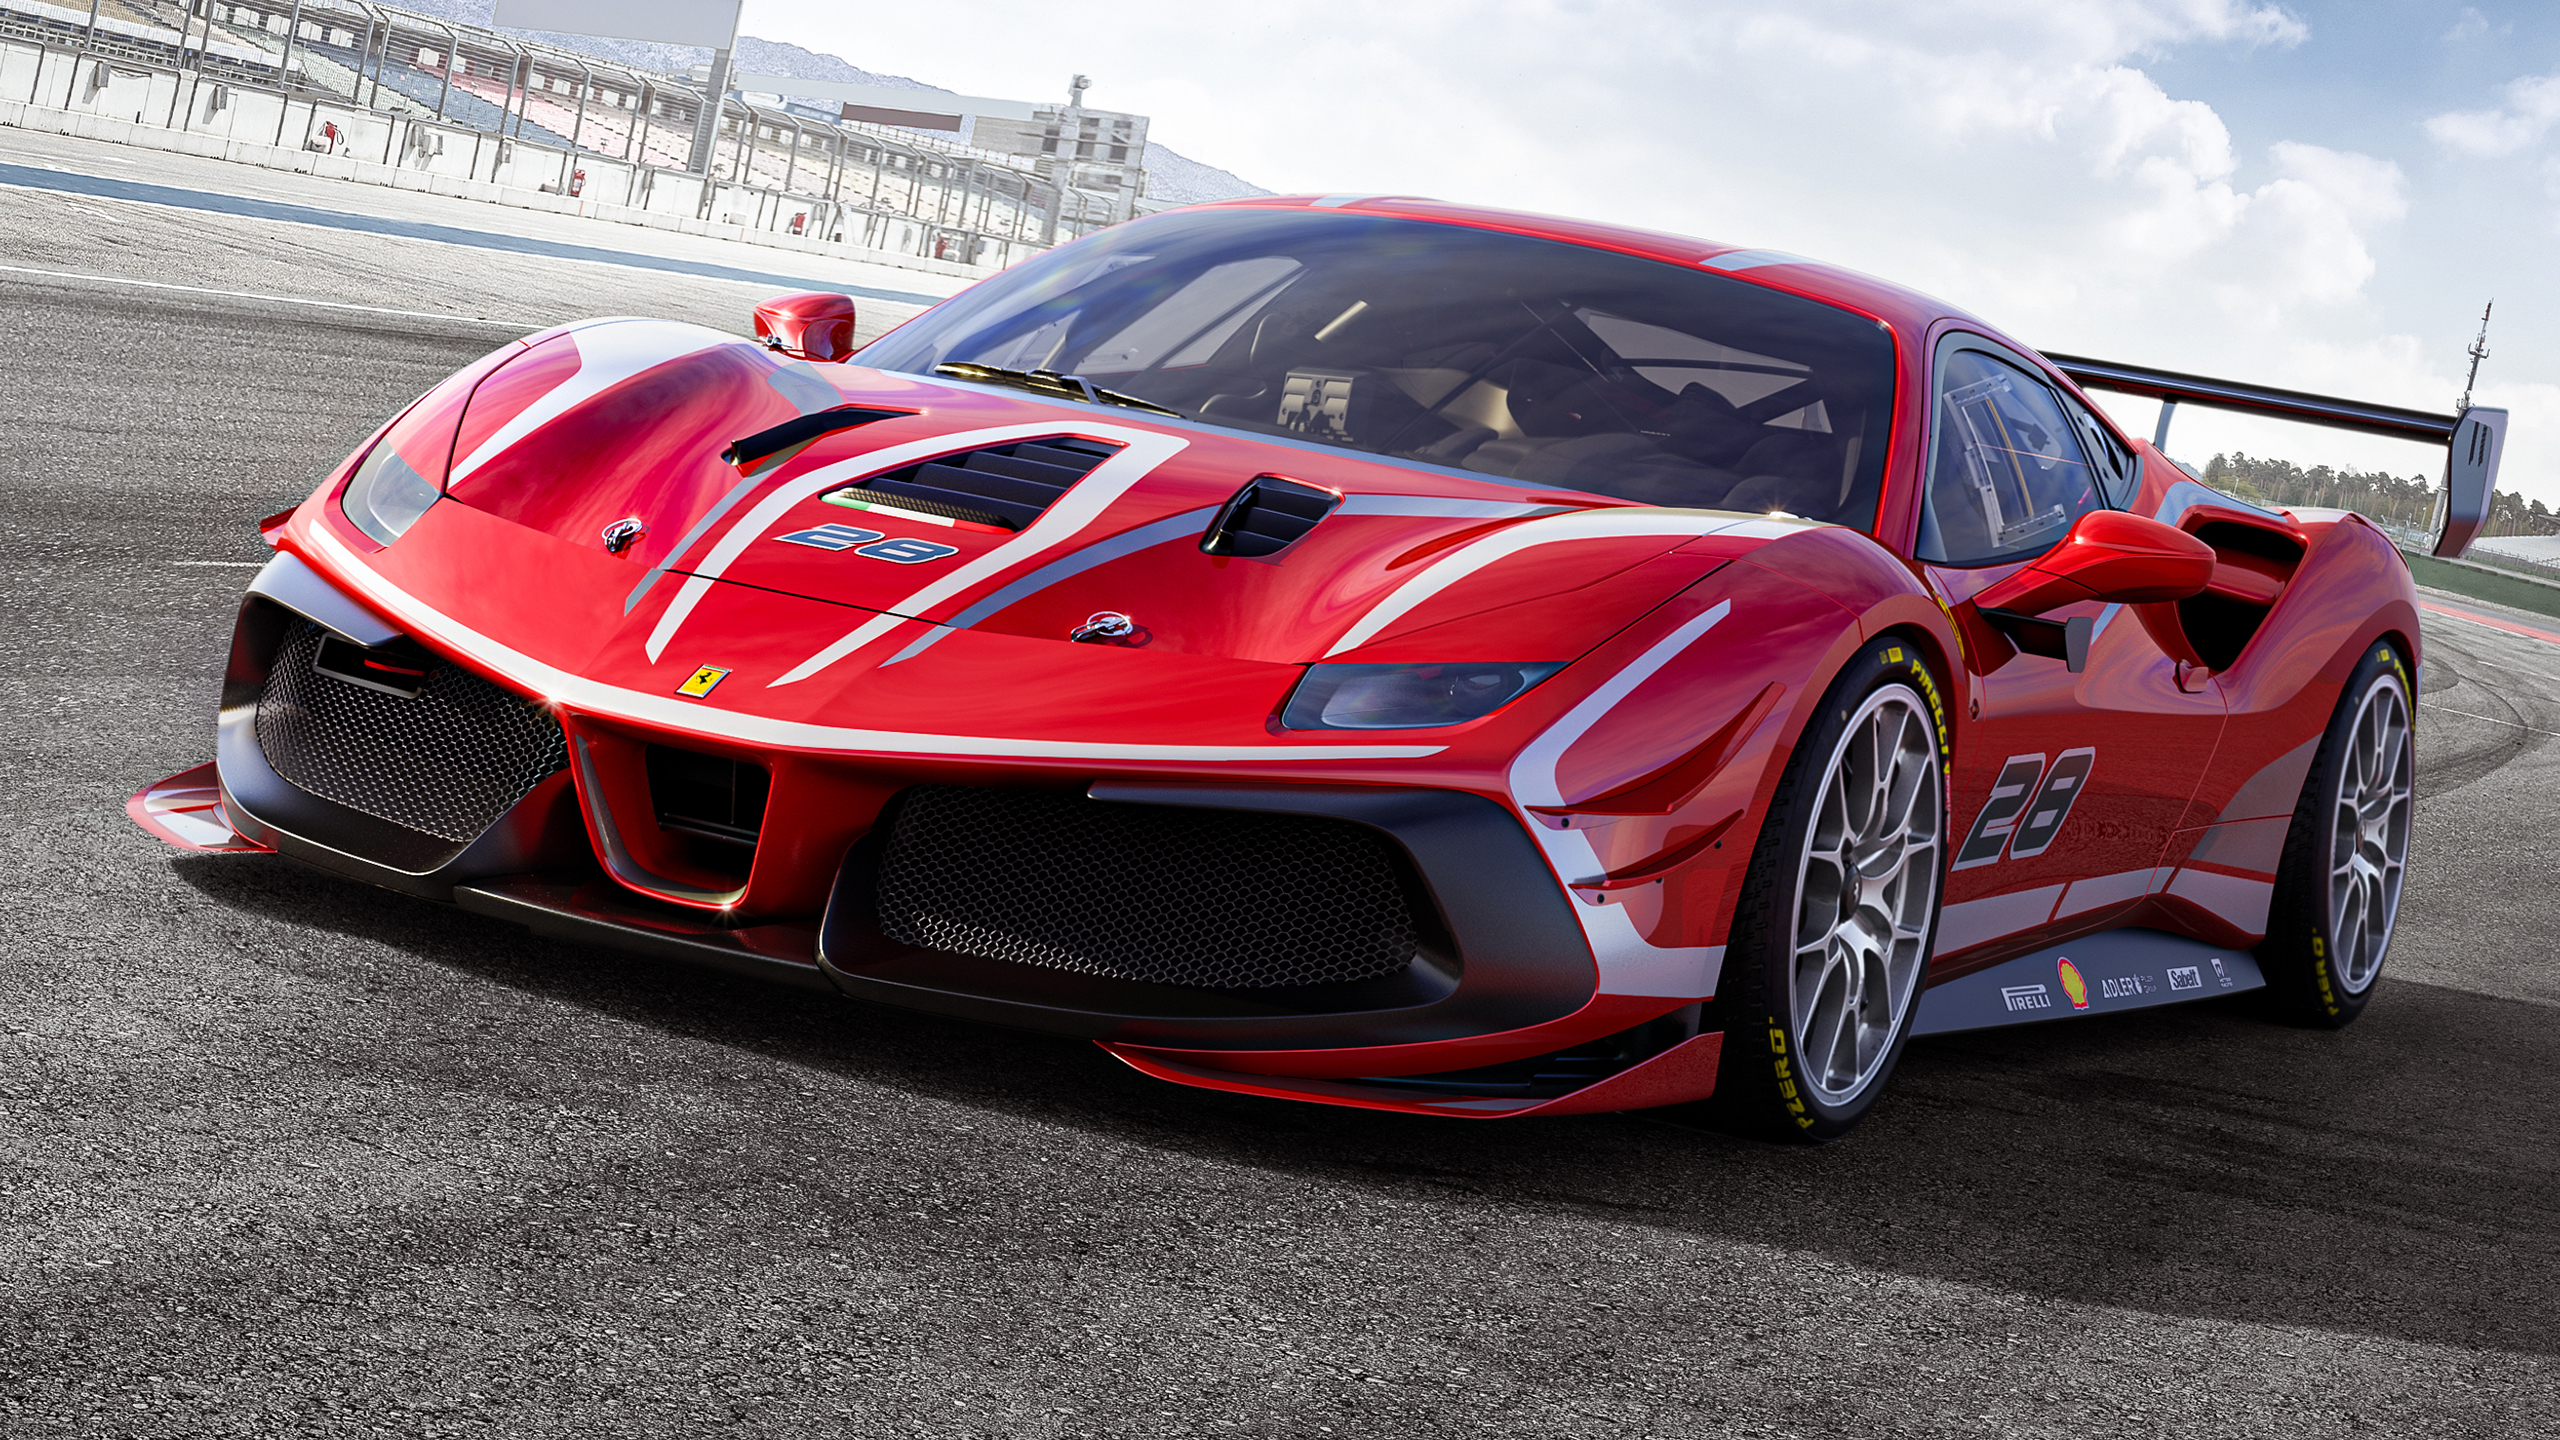 Ferrari 488 Challenge Evo 2020 2 Wallpaper HD Car Wallpapers 2560x1440